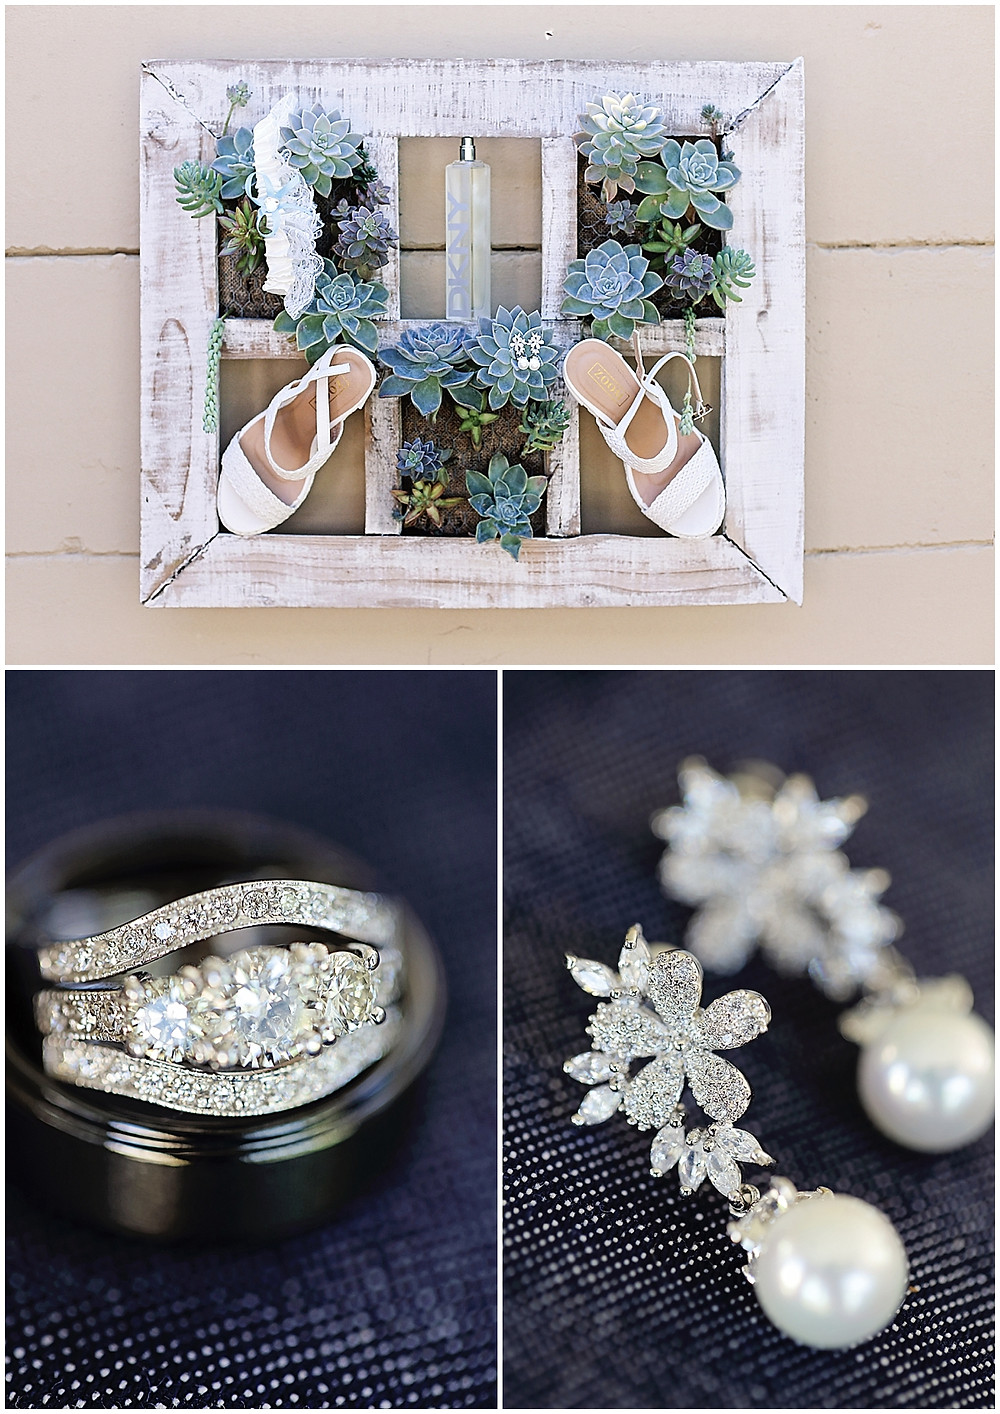 Denim + Jenna _ Denim and Lace themed wedding_0022.jpg